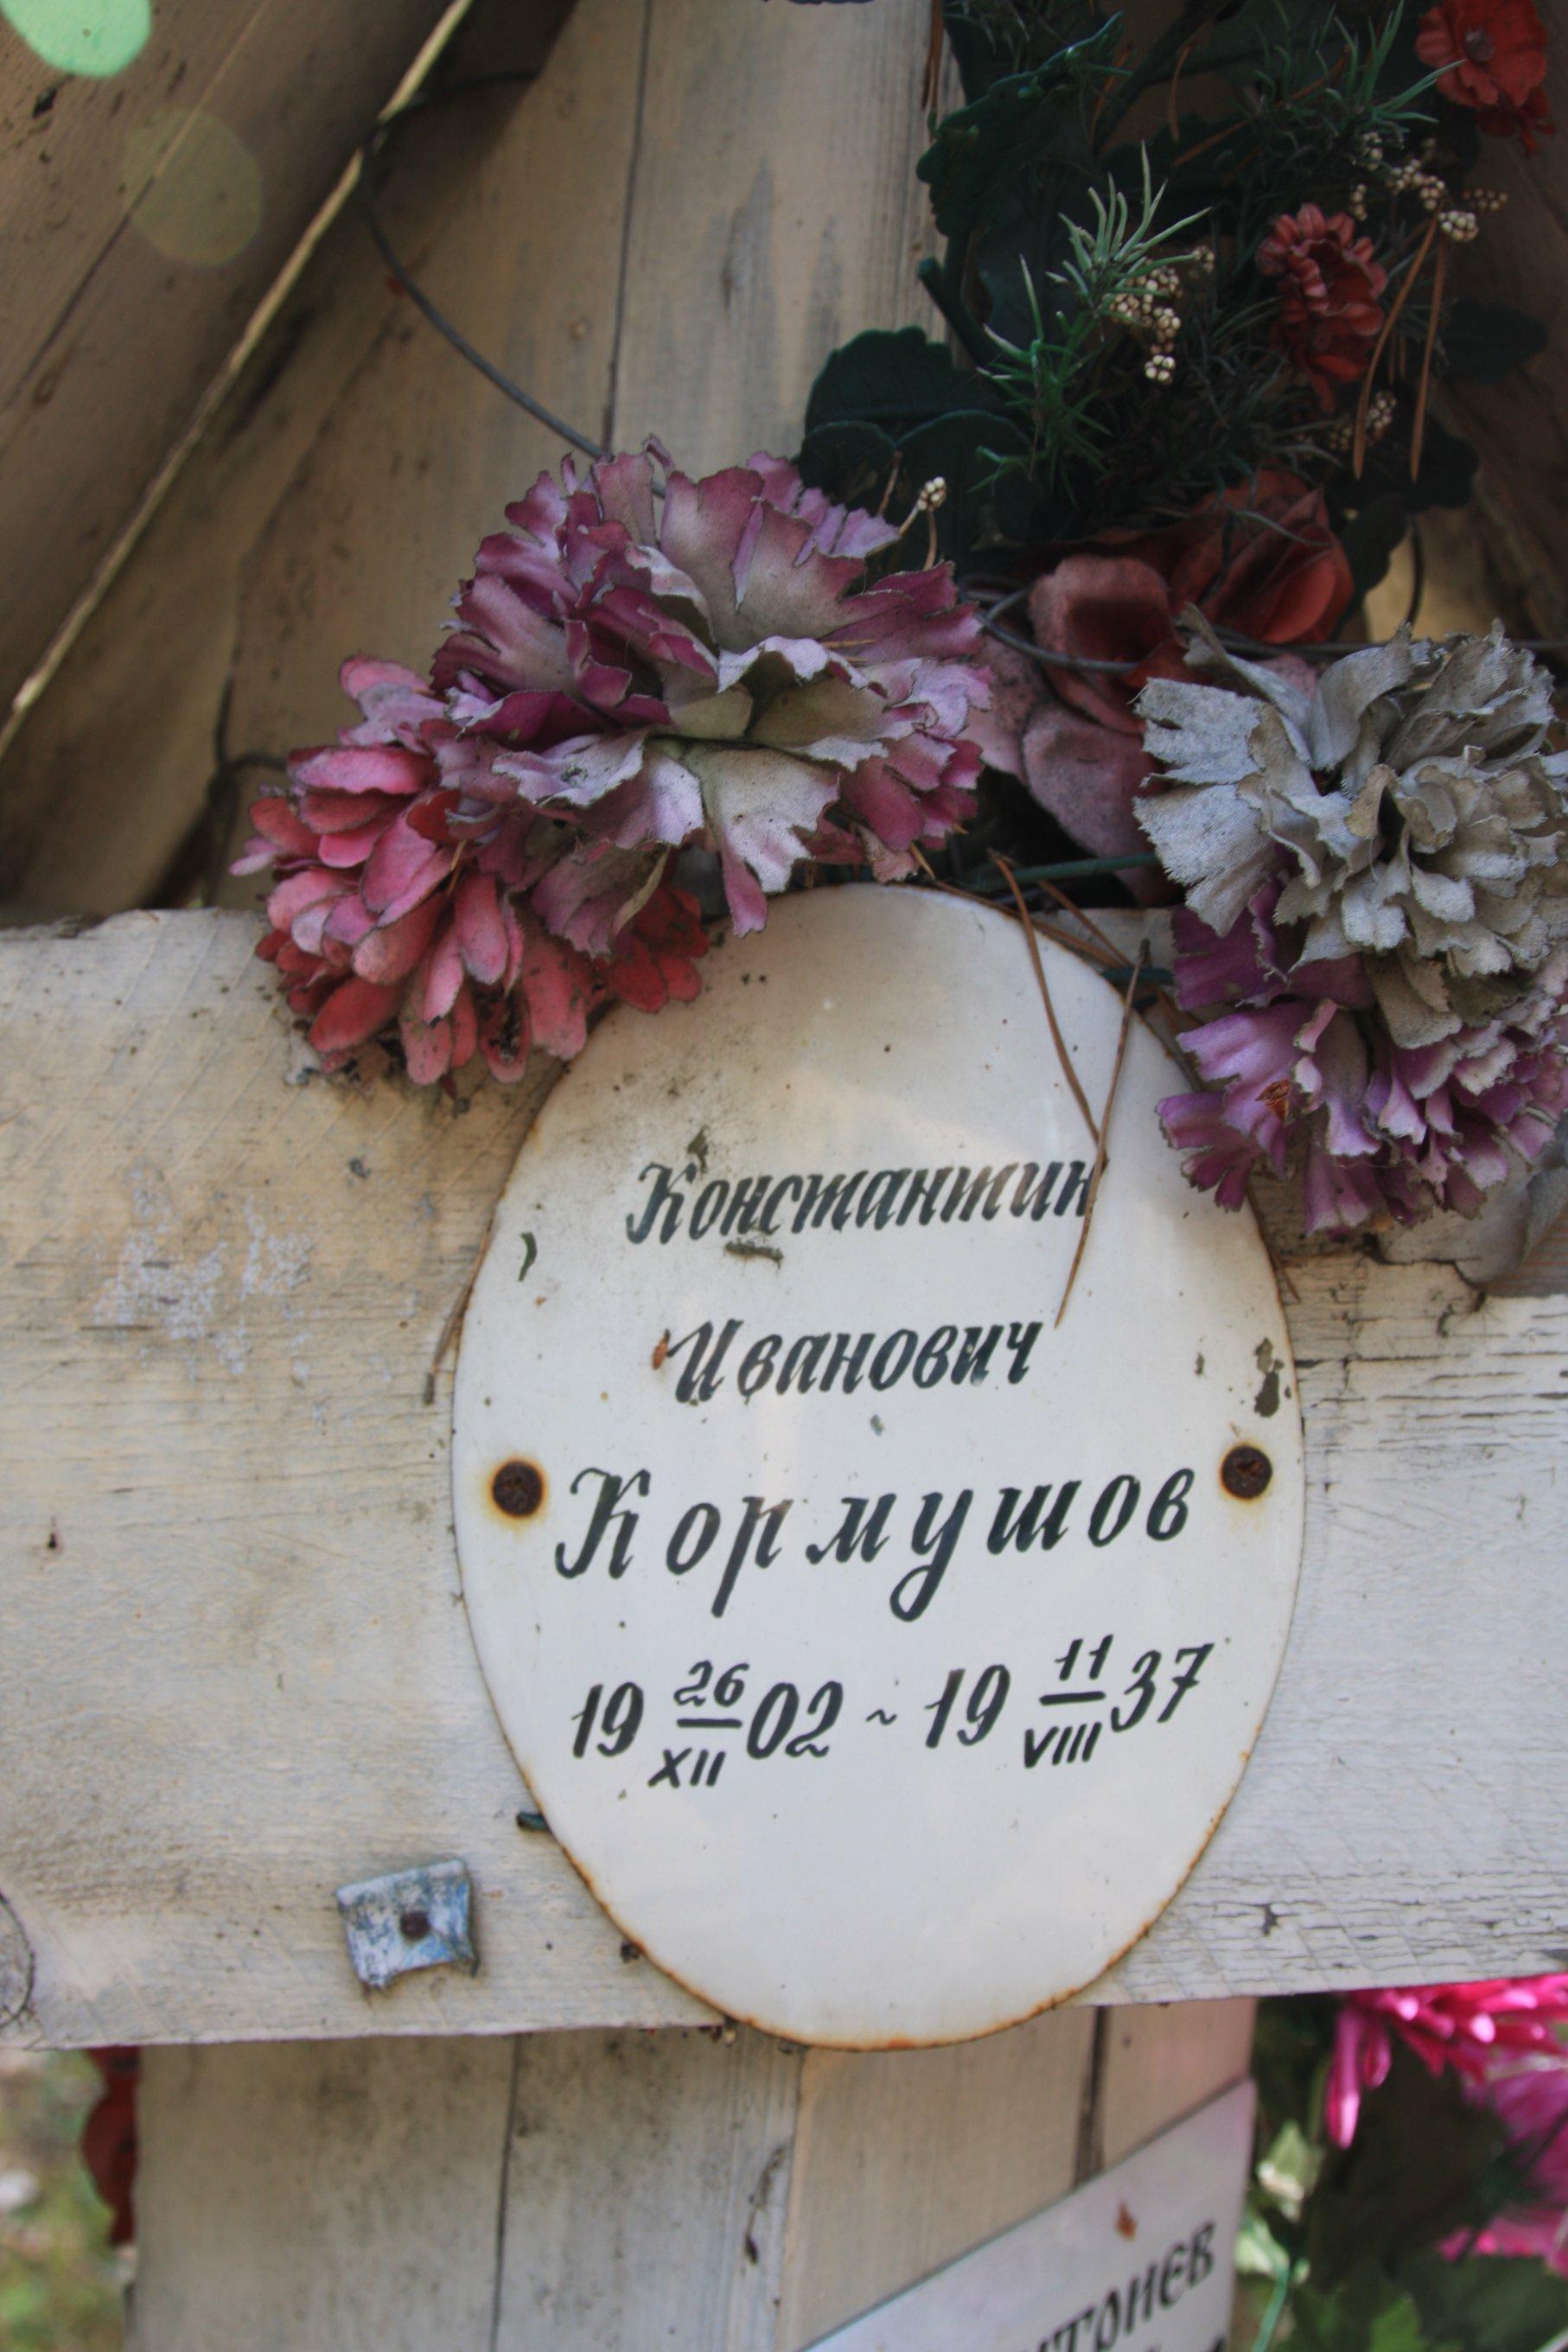 Памятная табличка «Константин Иванович Кормушов». Фото 04.08.2018.